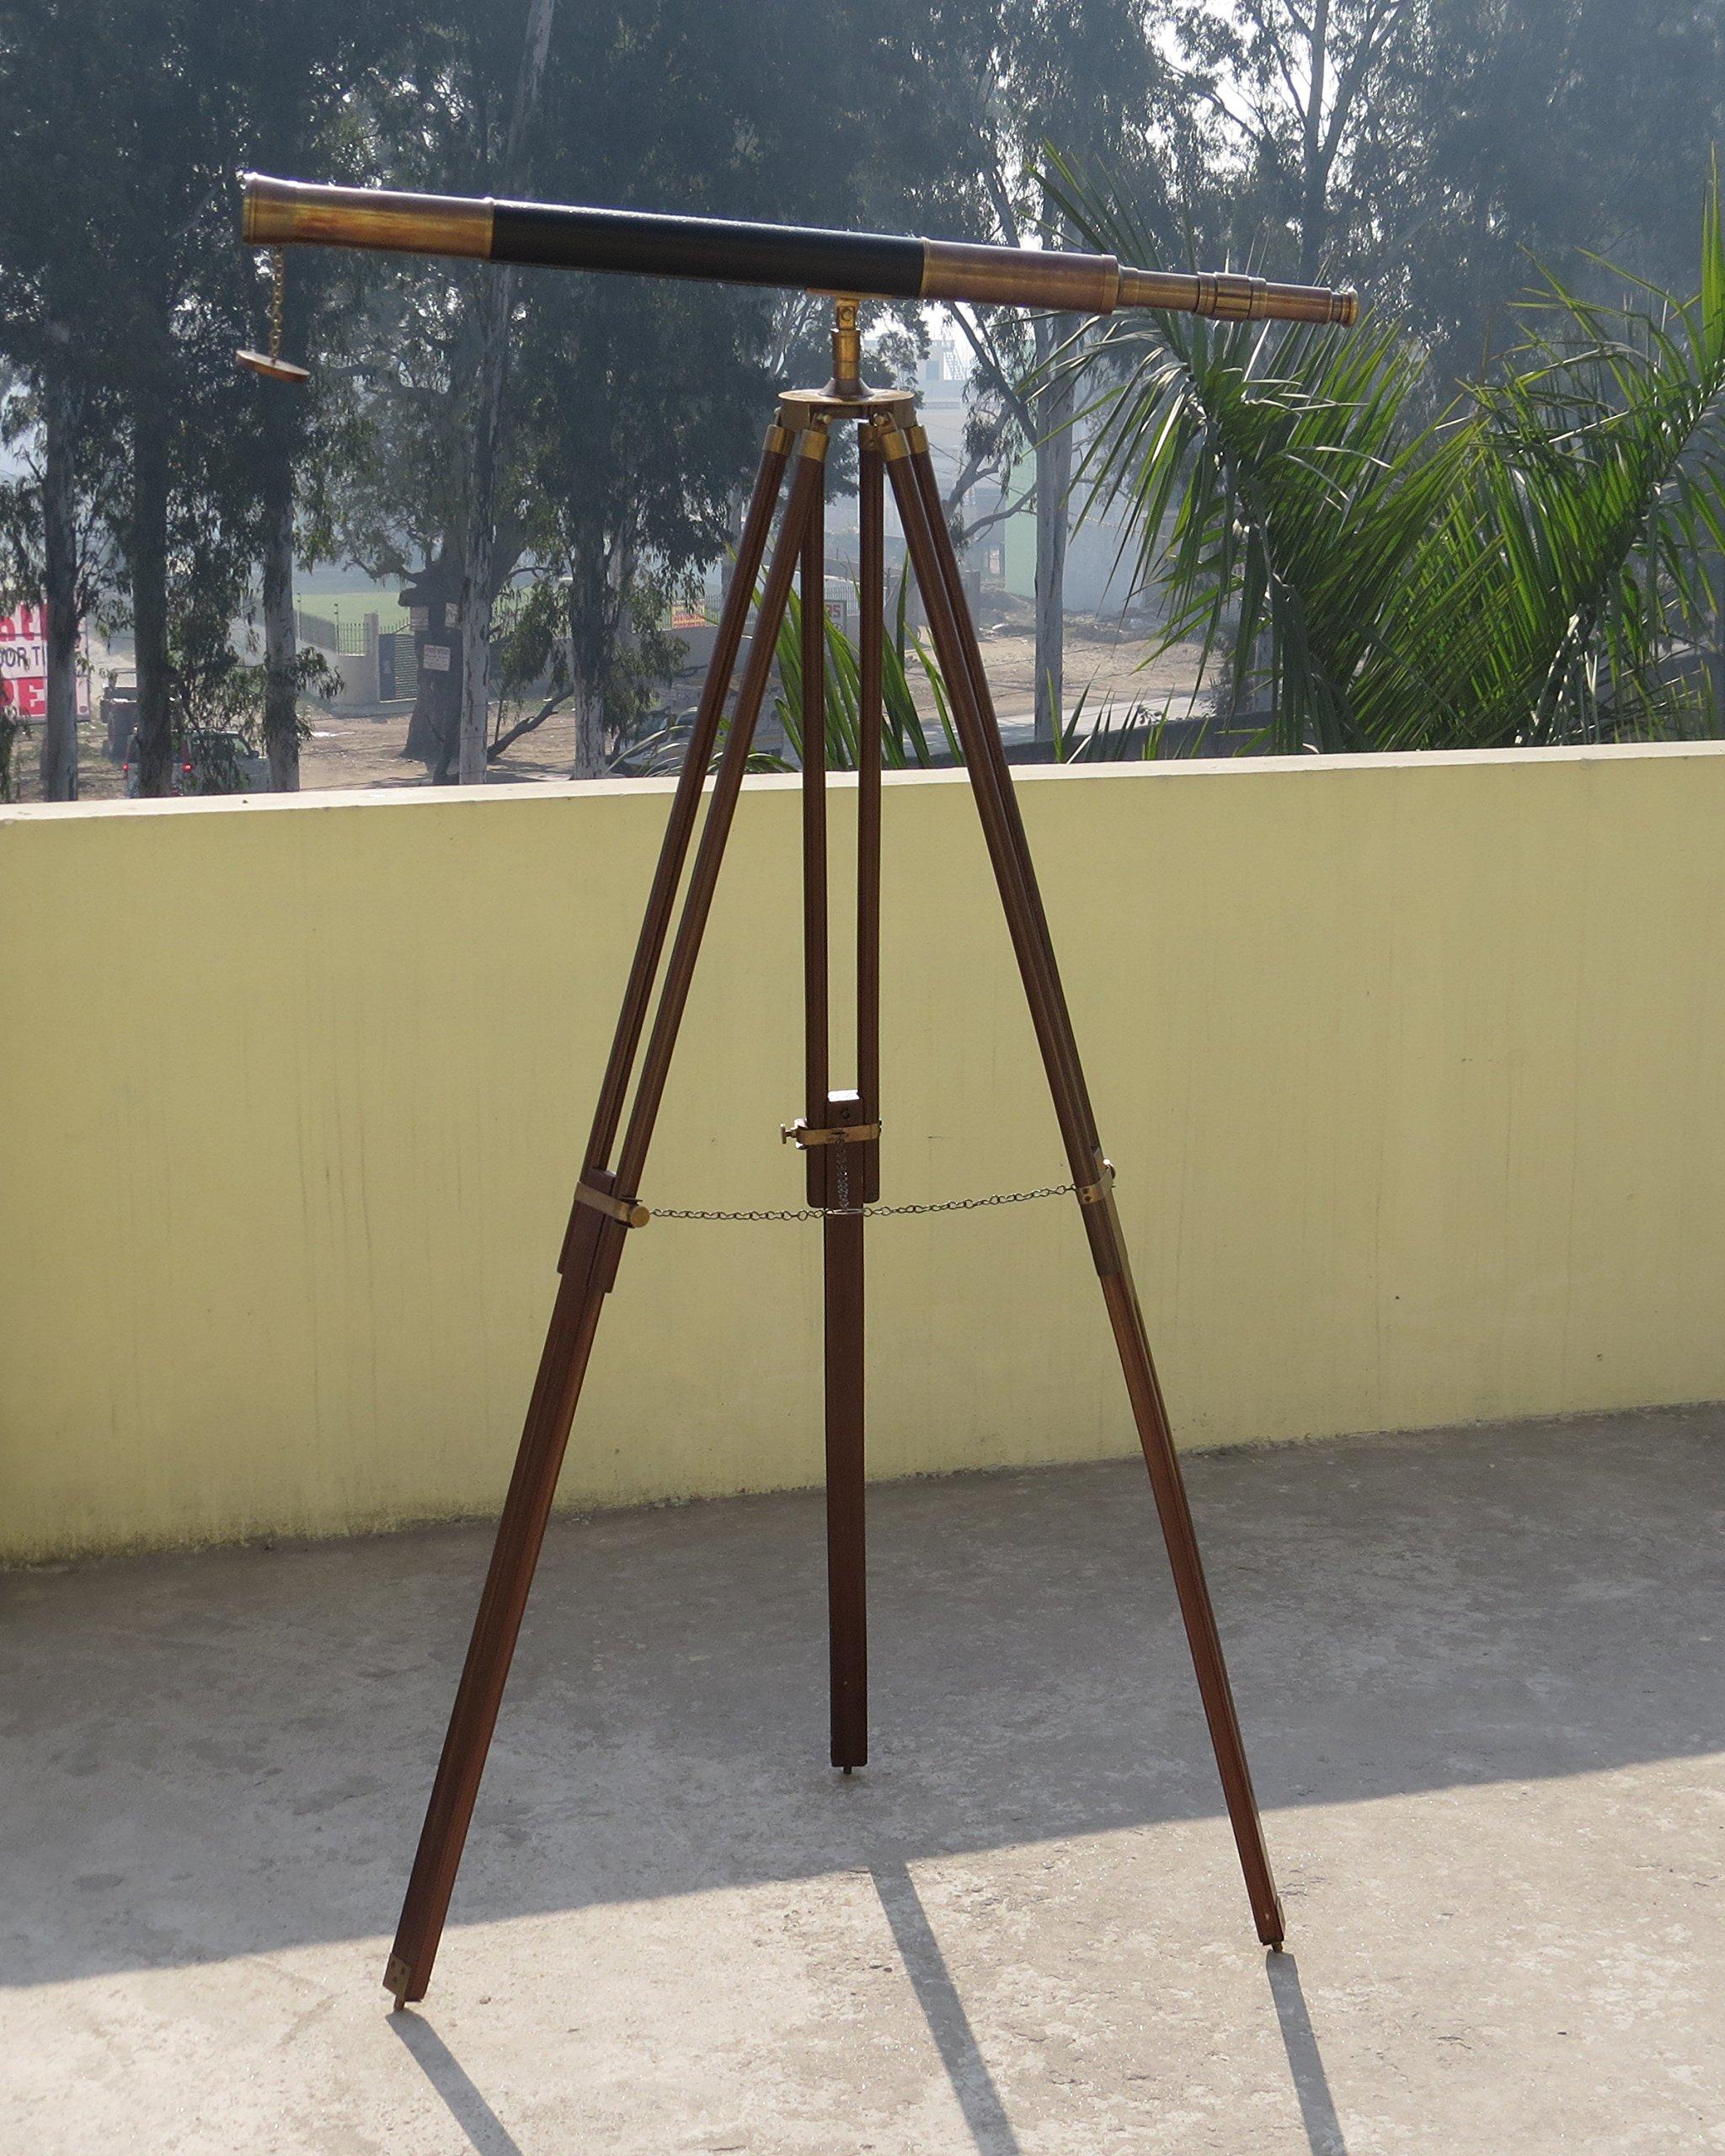 Antique Brass Telescope- Exclusive Replica by NauticalMart